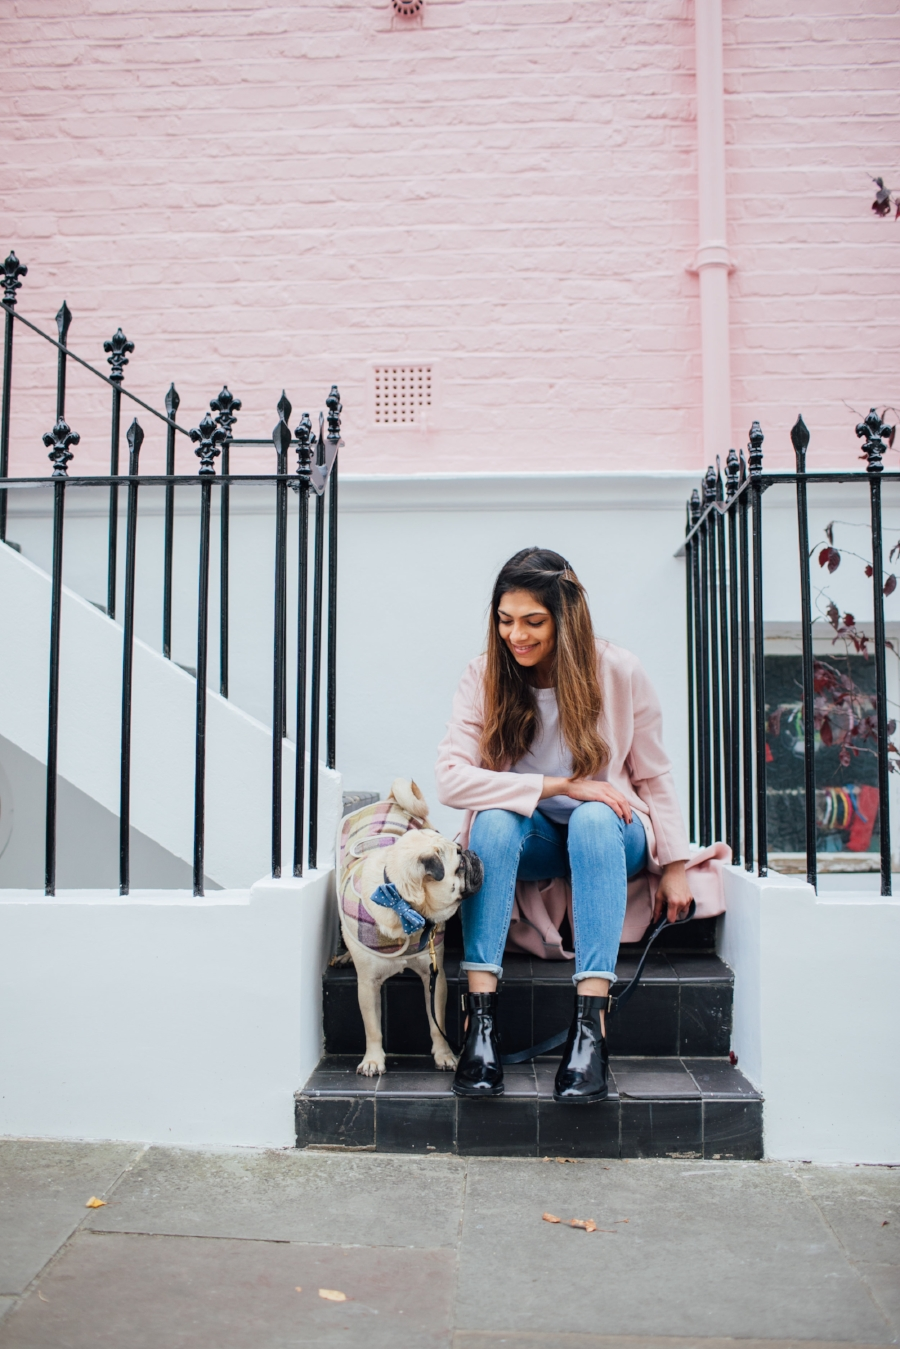 dogblog-london-bestdogbloginlondon-dogfashion-dogfashionblog-fashionandlifestyle-streetstyle-pugswag-humanandhound-pink-fallfashion-falltrends-dogsinclothes-dapperdogs-pug-puglife-bestdressedpug-fashionblogger-newyork-uk-pinkwintercoat-puglife-twinning-bestdressedpug-awesome-best-bestdogbloglondon-dogfashionlondon-coolestdogblog-cooldogs-vintagecar-mint -topdogbloglondon-bestdogblog